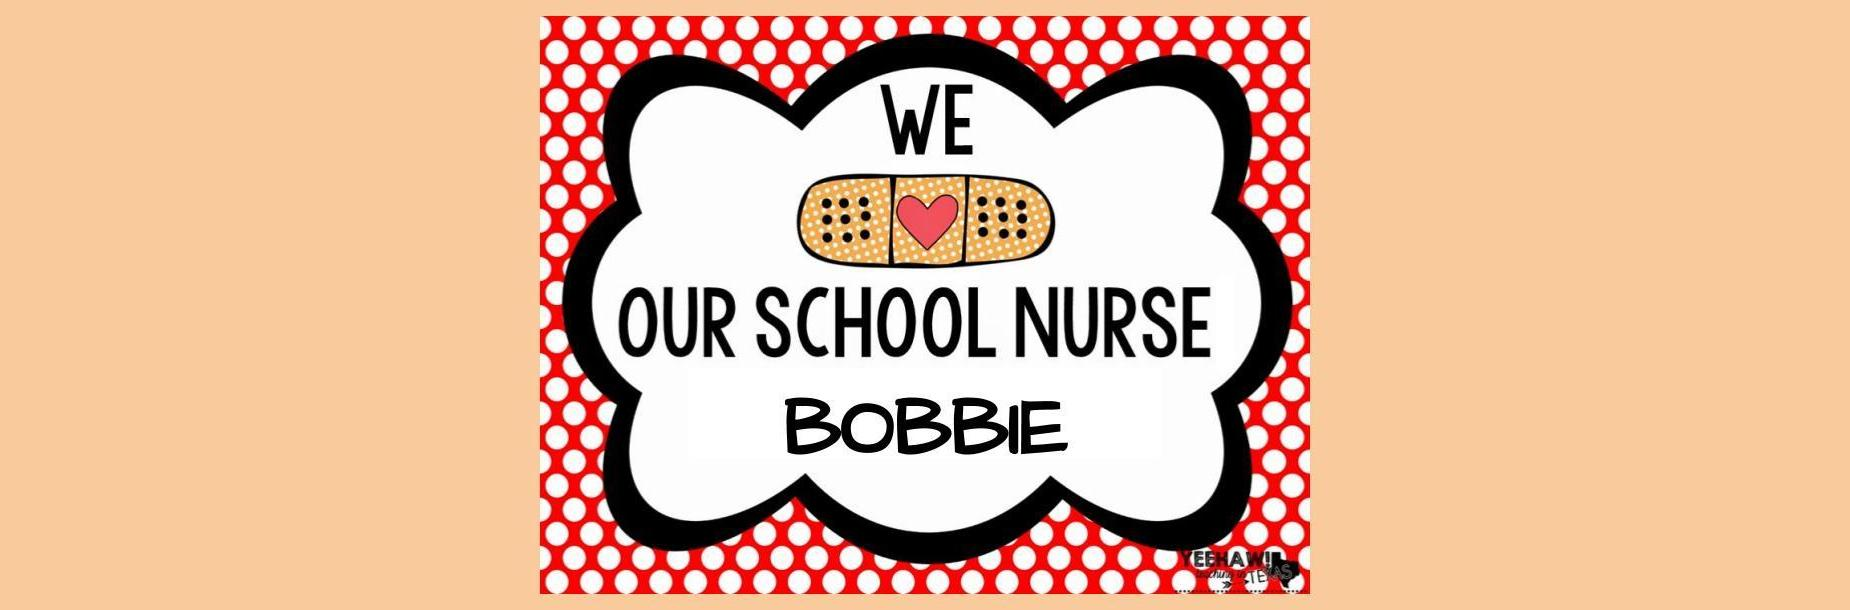 Nurse Bobbie